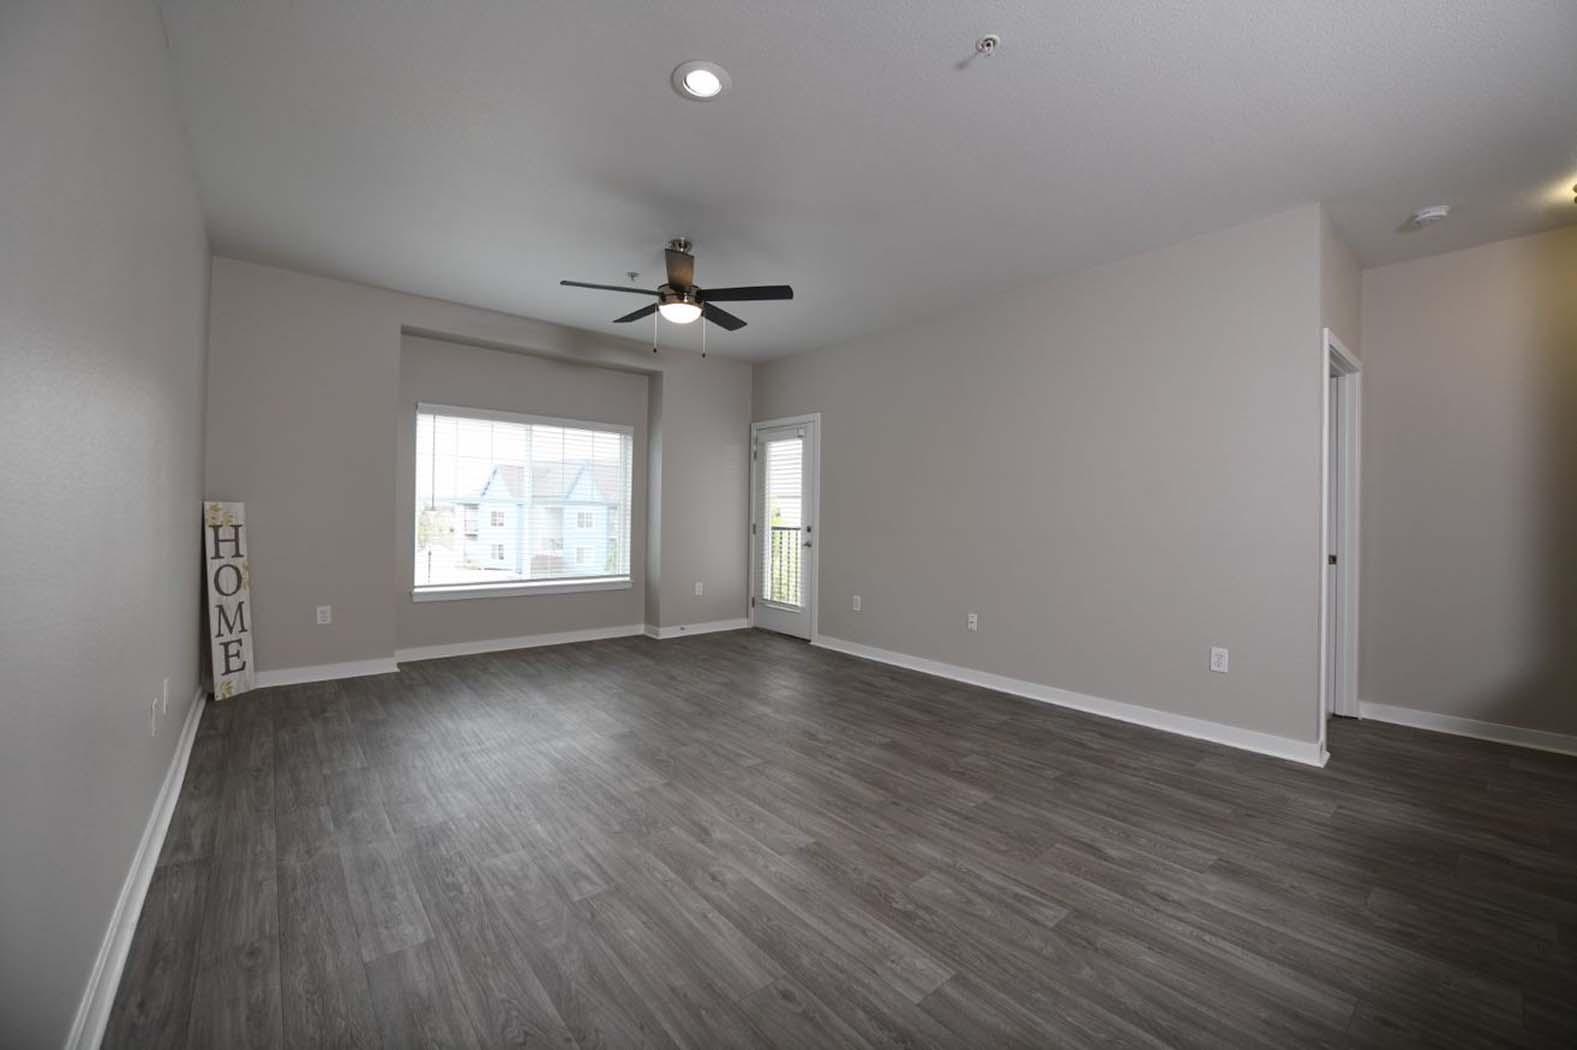 Engineered Wood Flooring at Domaine at Villebois Apartment Homes, Oregon, 97070